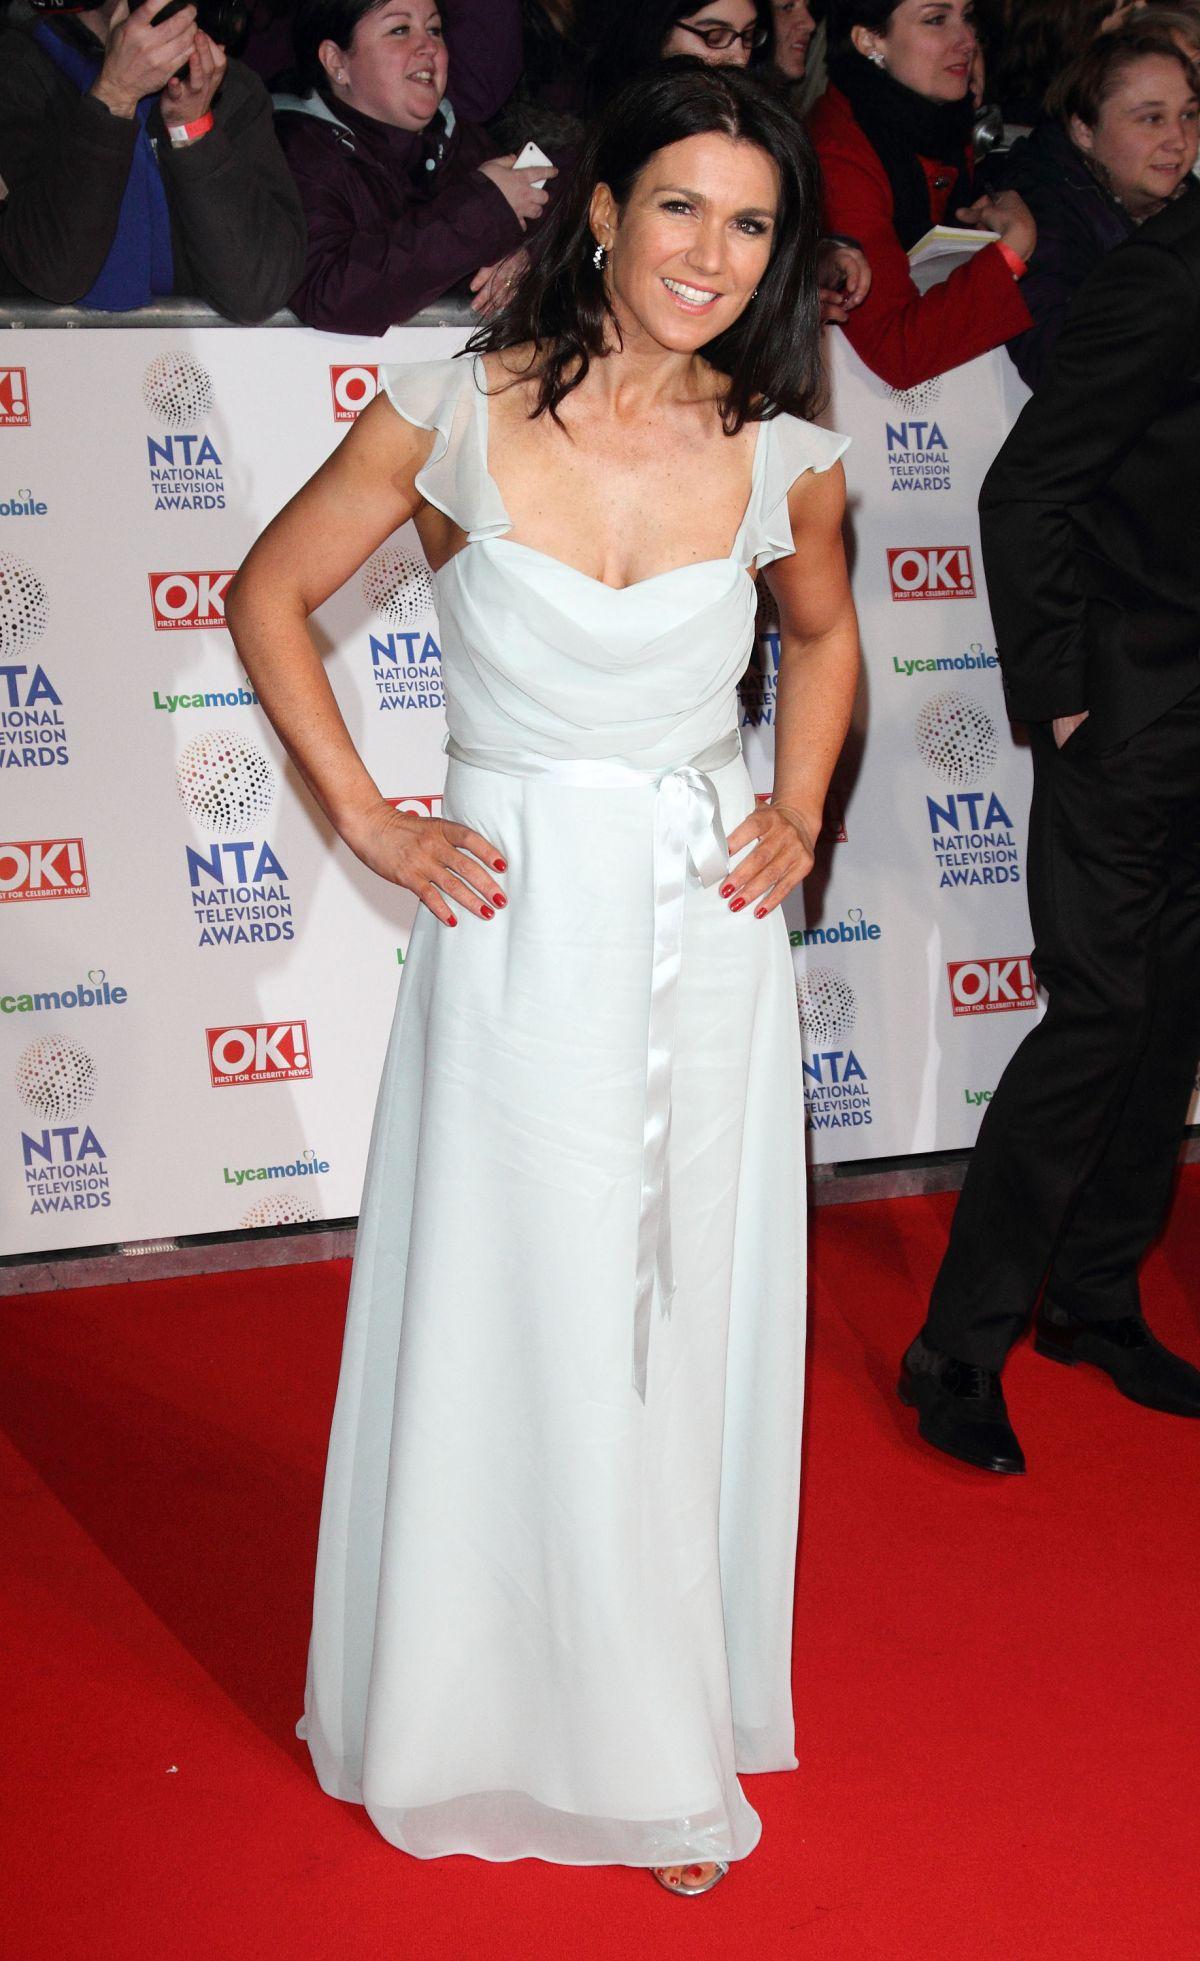 SUSANNA REID at 2014 National Television Awards in London